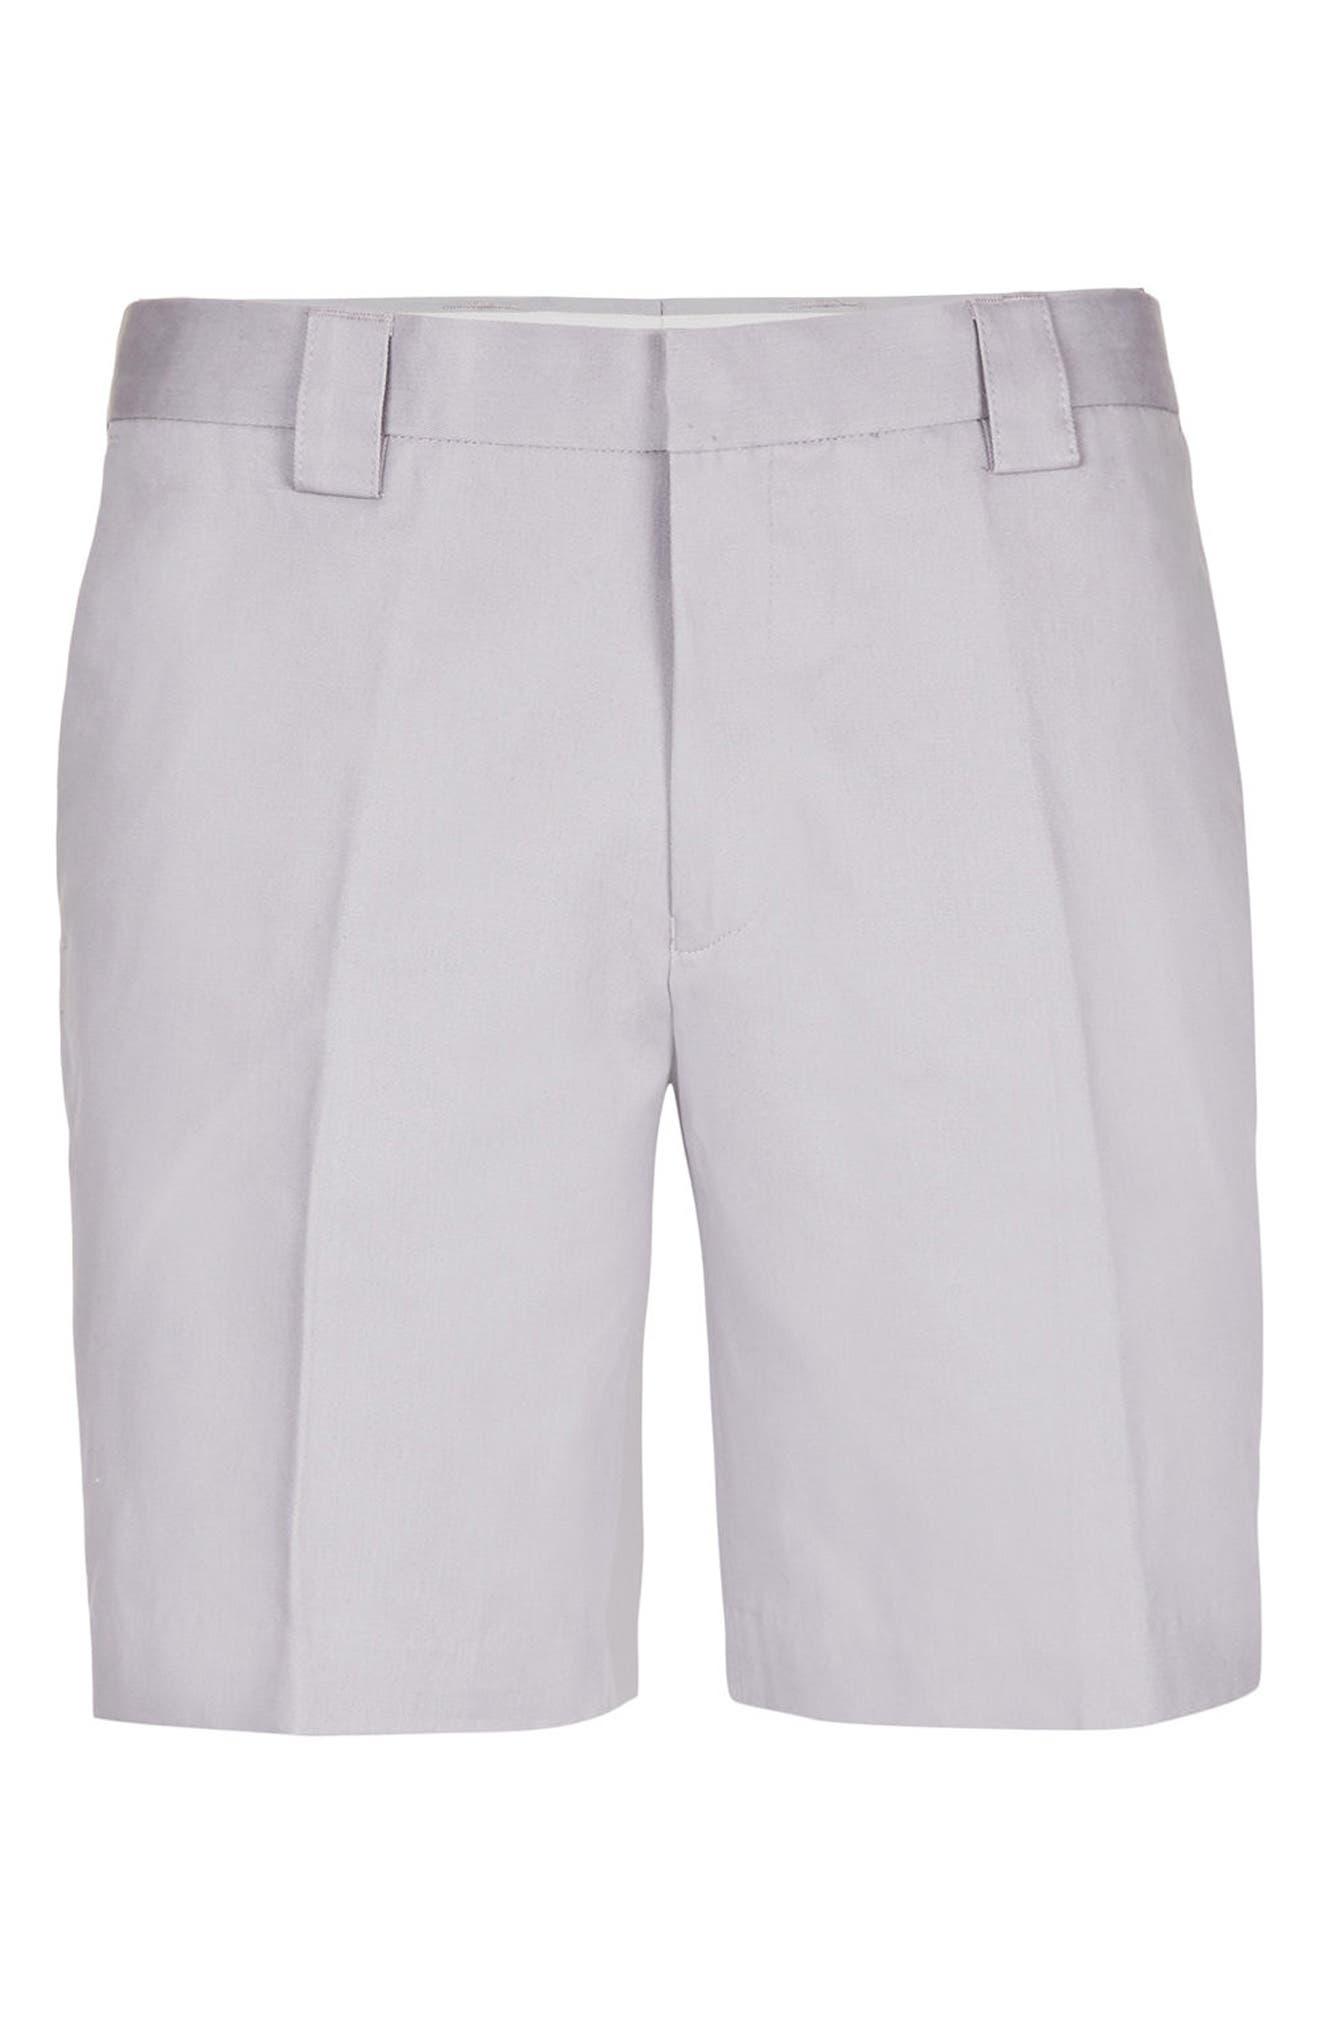 Twill Trouser Shorts,                             Alternate thumbnail 4, color,                             020